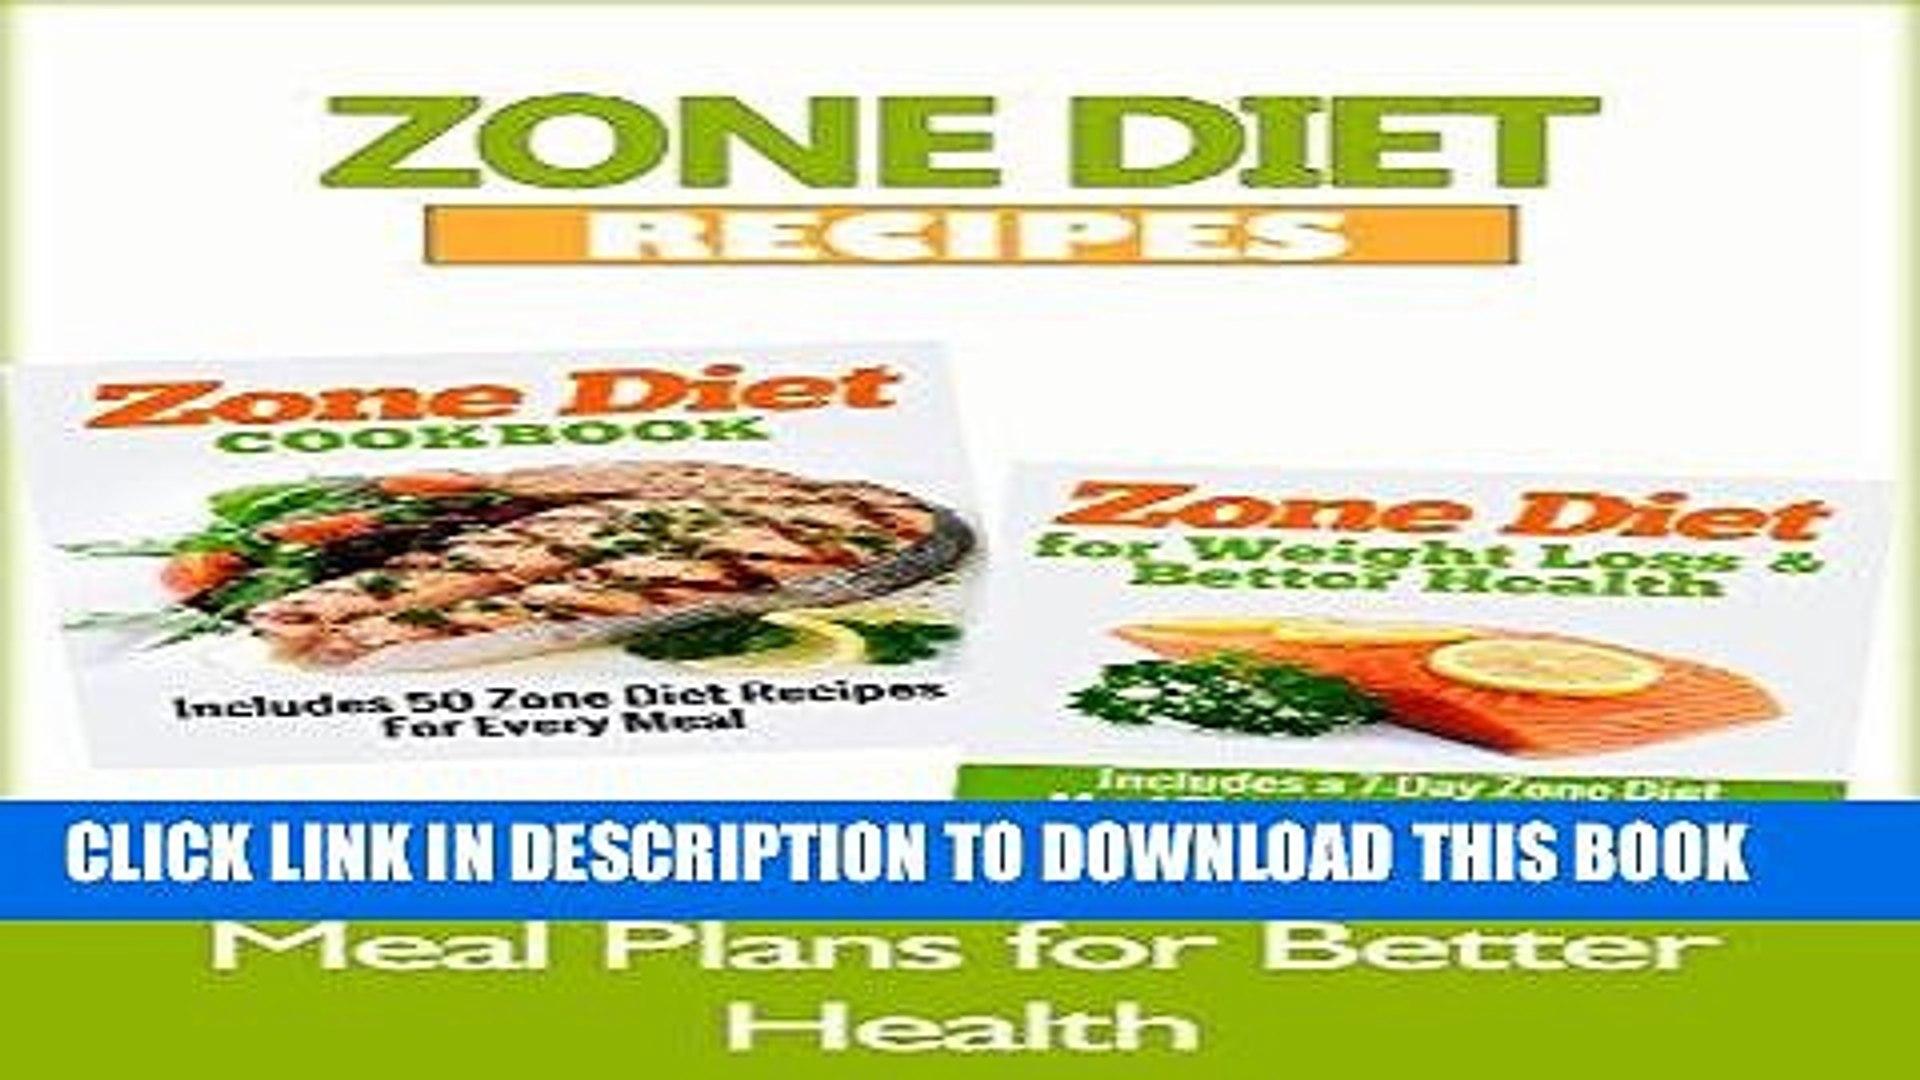 Best Seller ZONE DIET: Zone Diet Recipes - Meal Plans for Better Health (Diet Books, Diet, Healthy